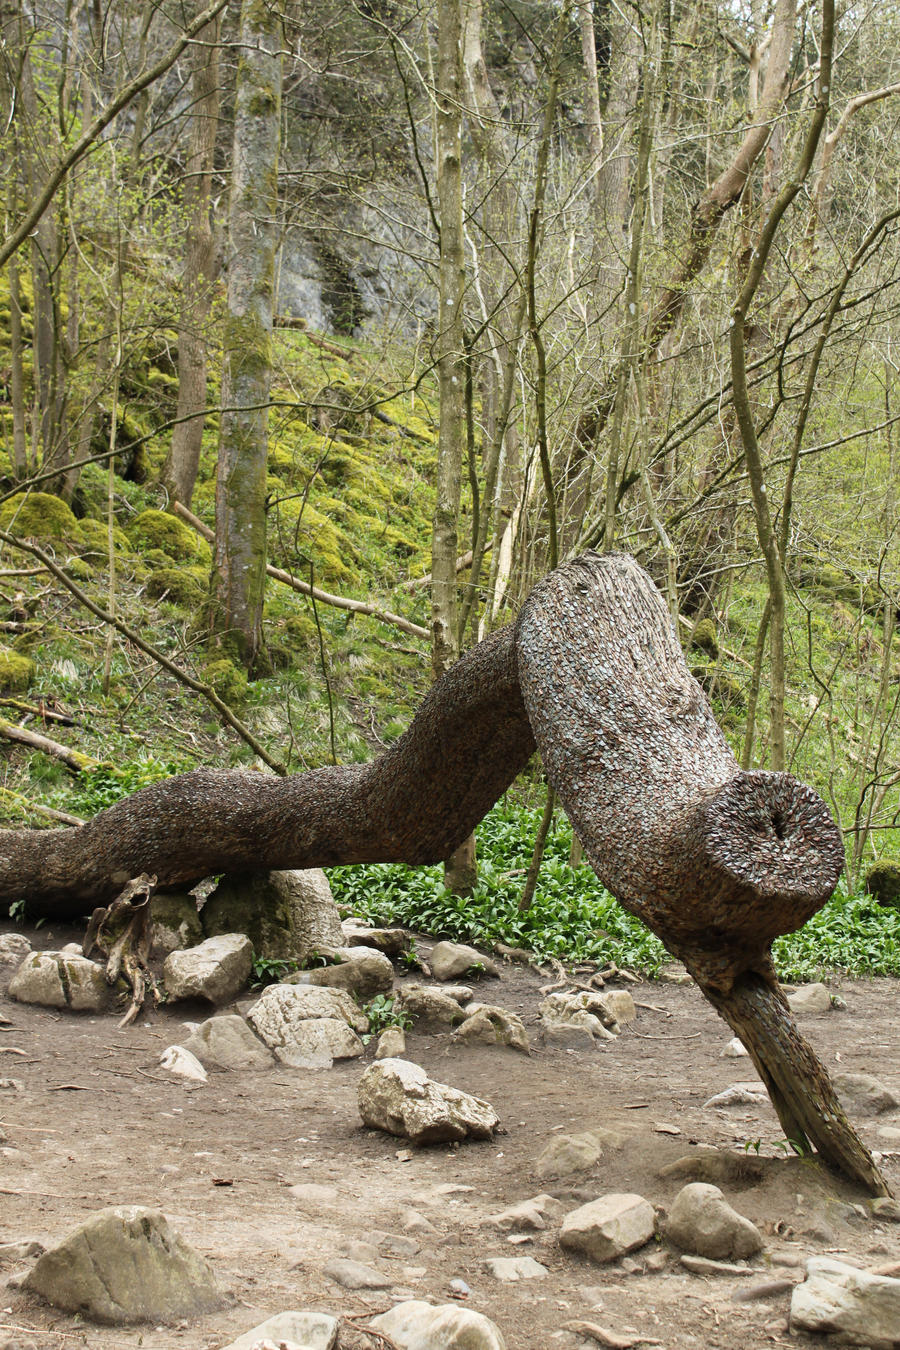 Ingleton Falls Coin Tree 1 by Tasastock